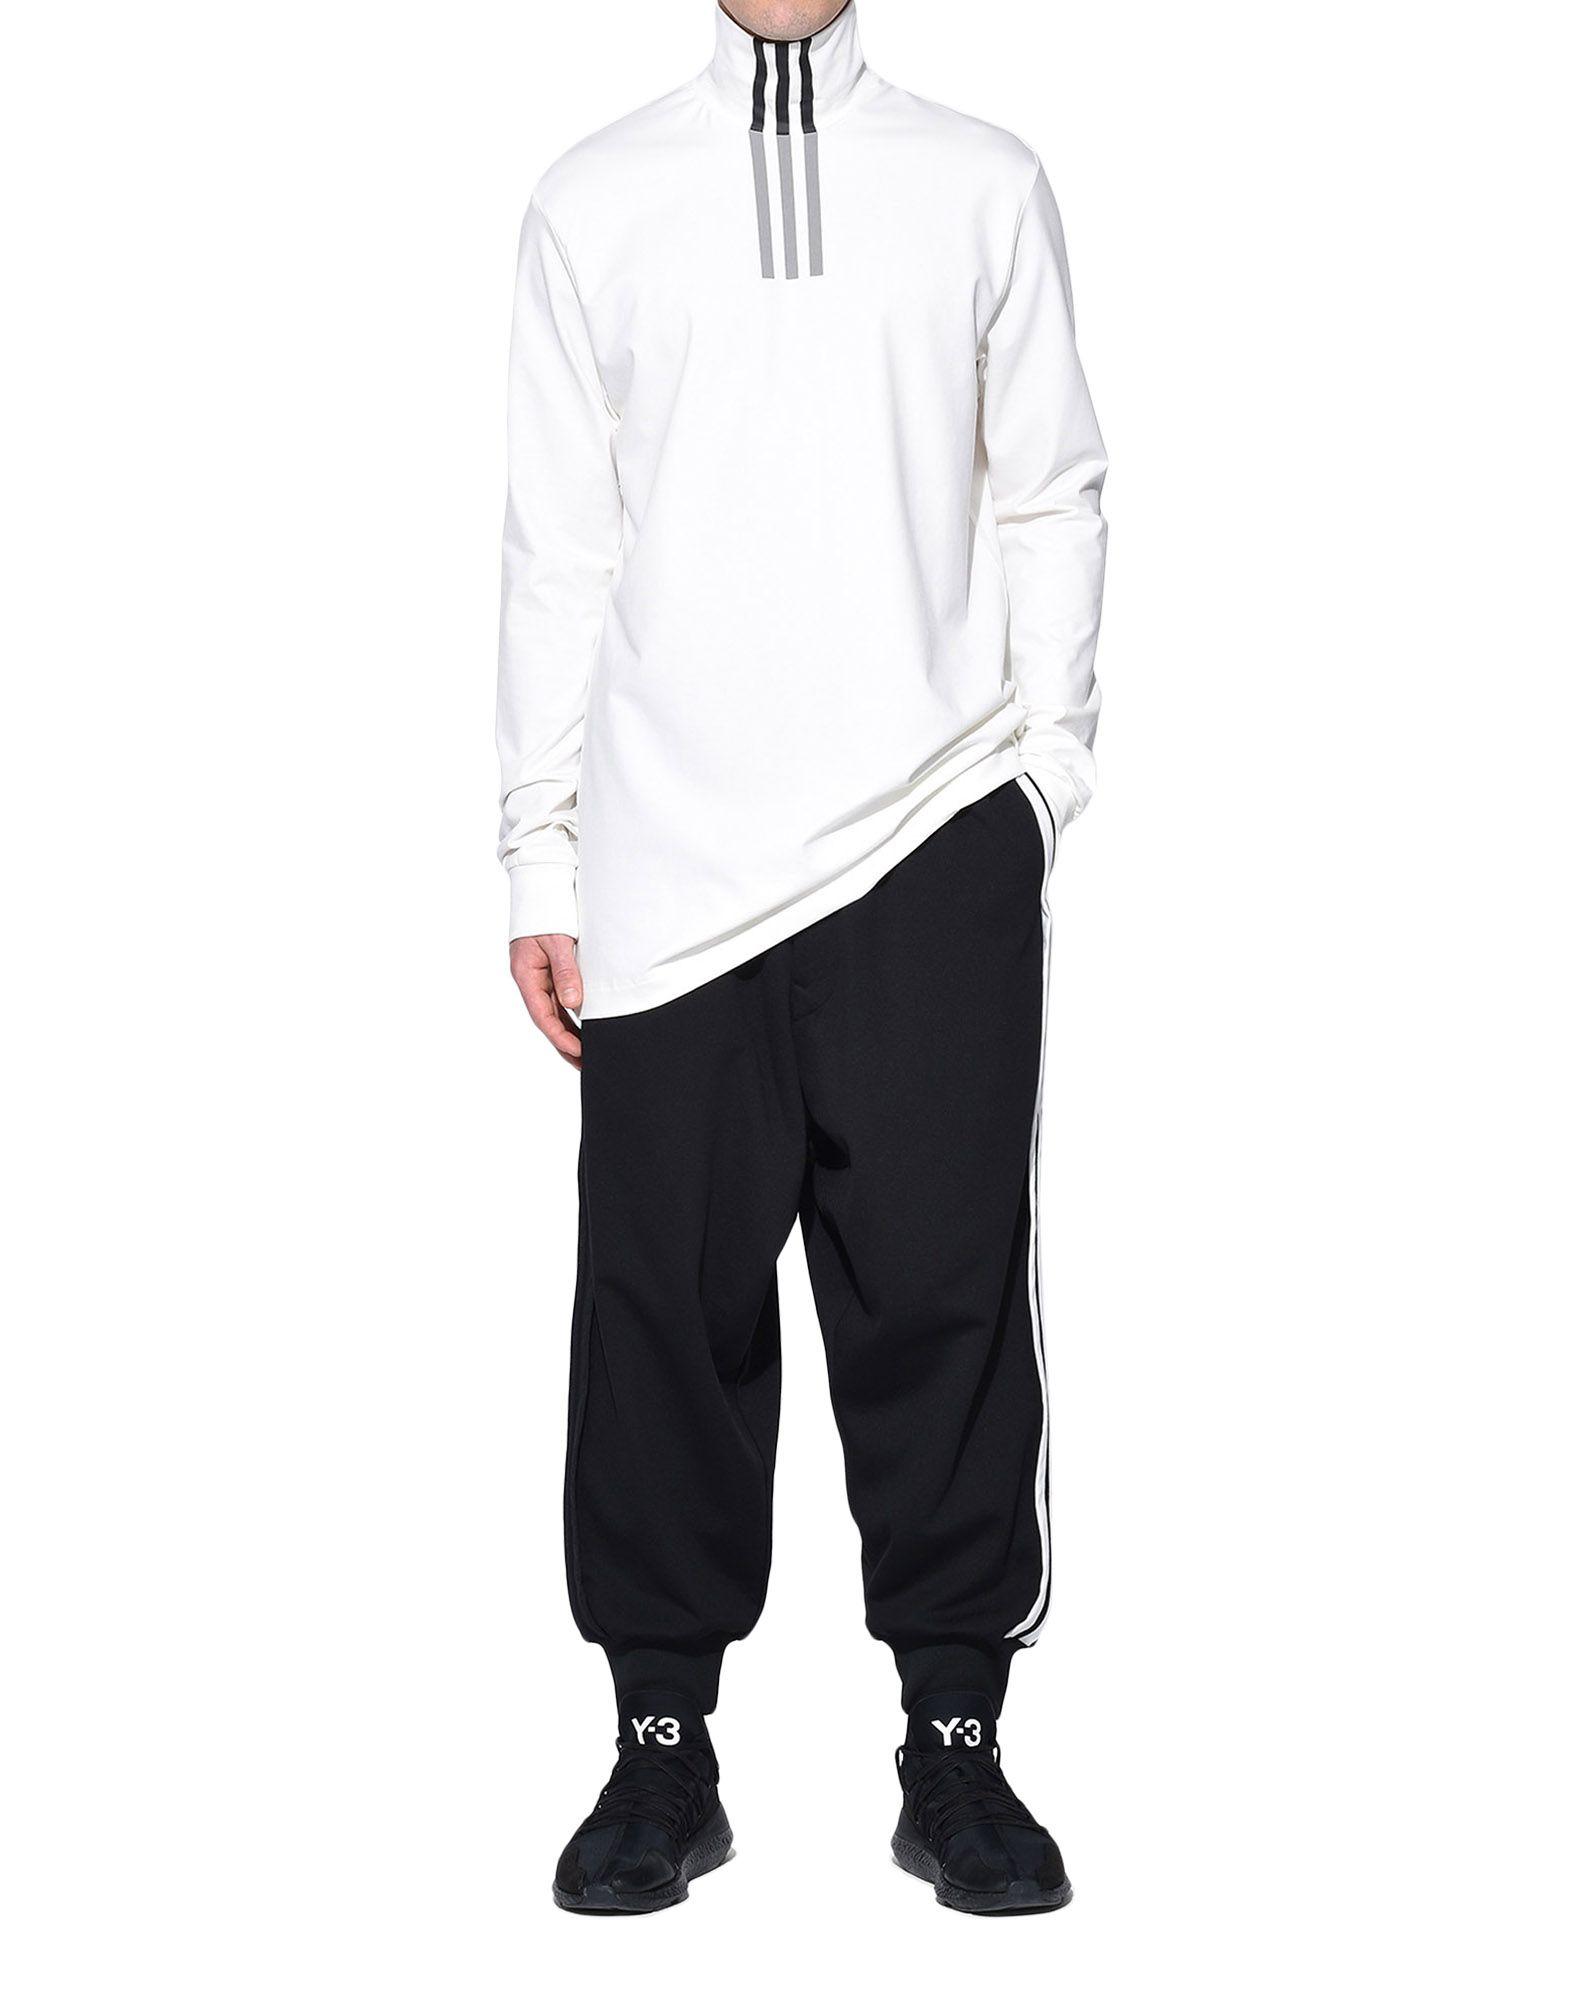 Y-3 Y-3 3-Stripes High Neck Tee Long sleeve t-shirt Man a